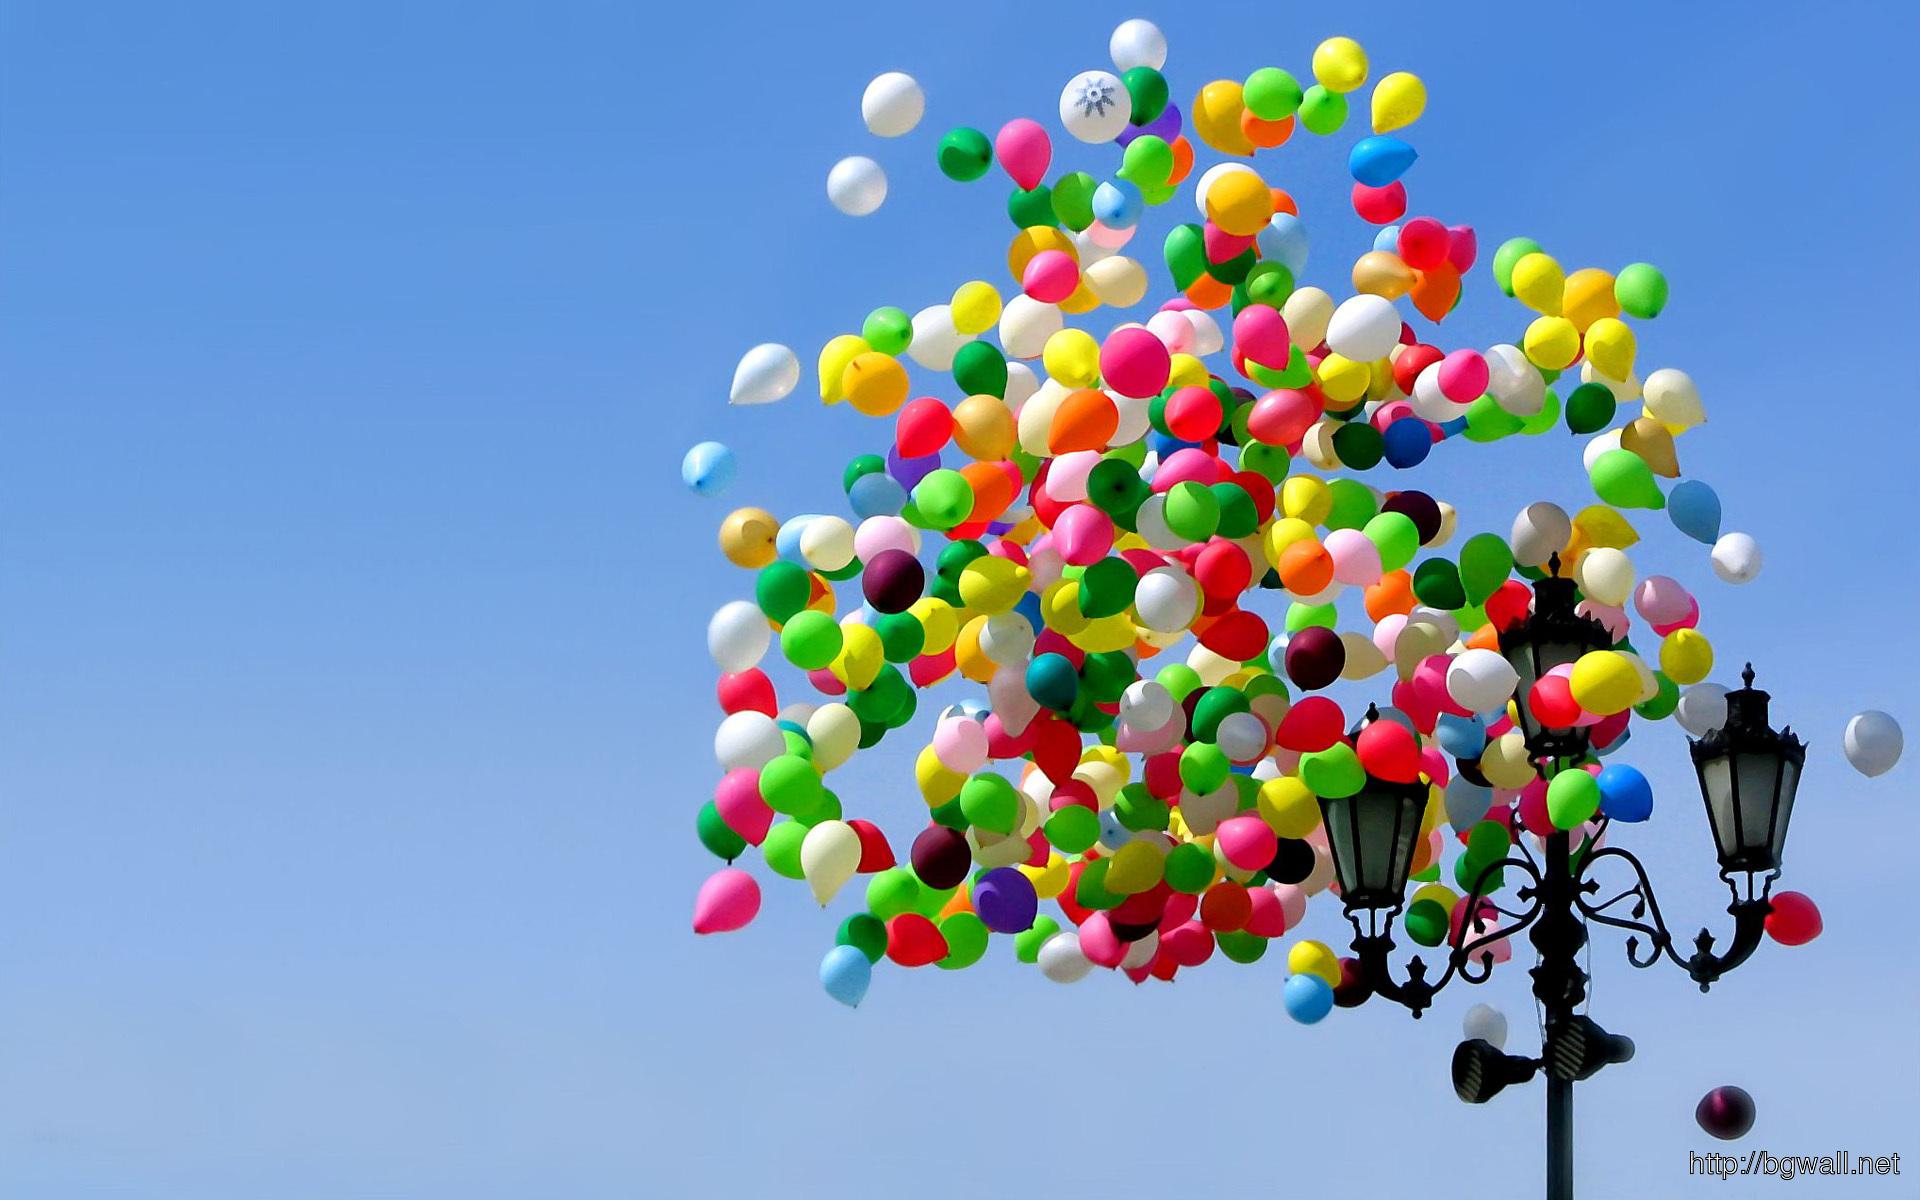 Balloons-High-Res-Wallpaper